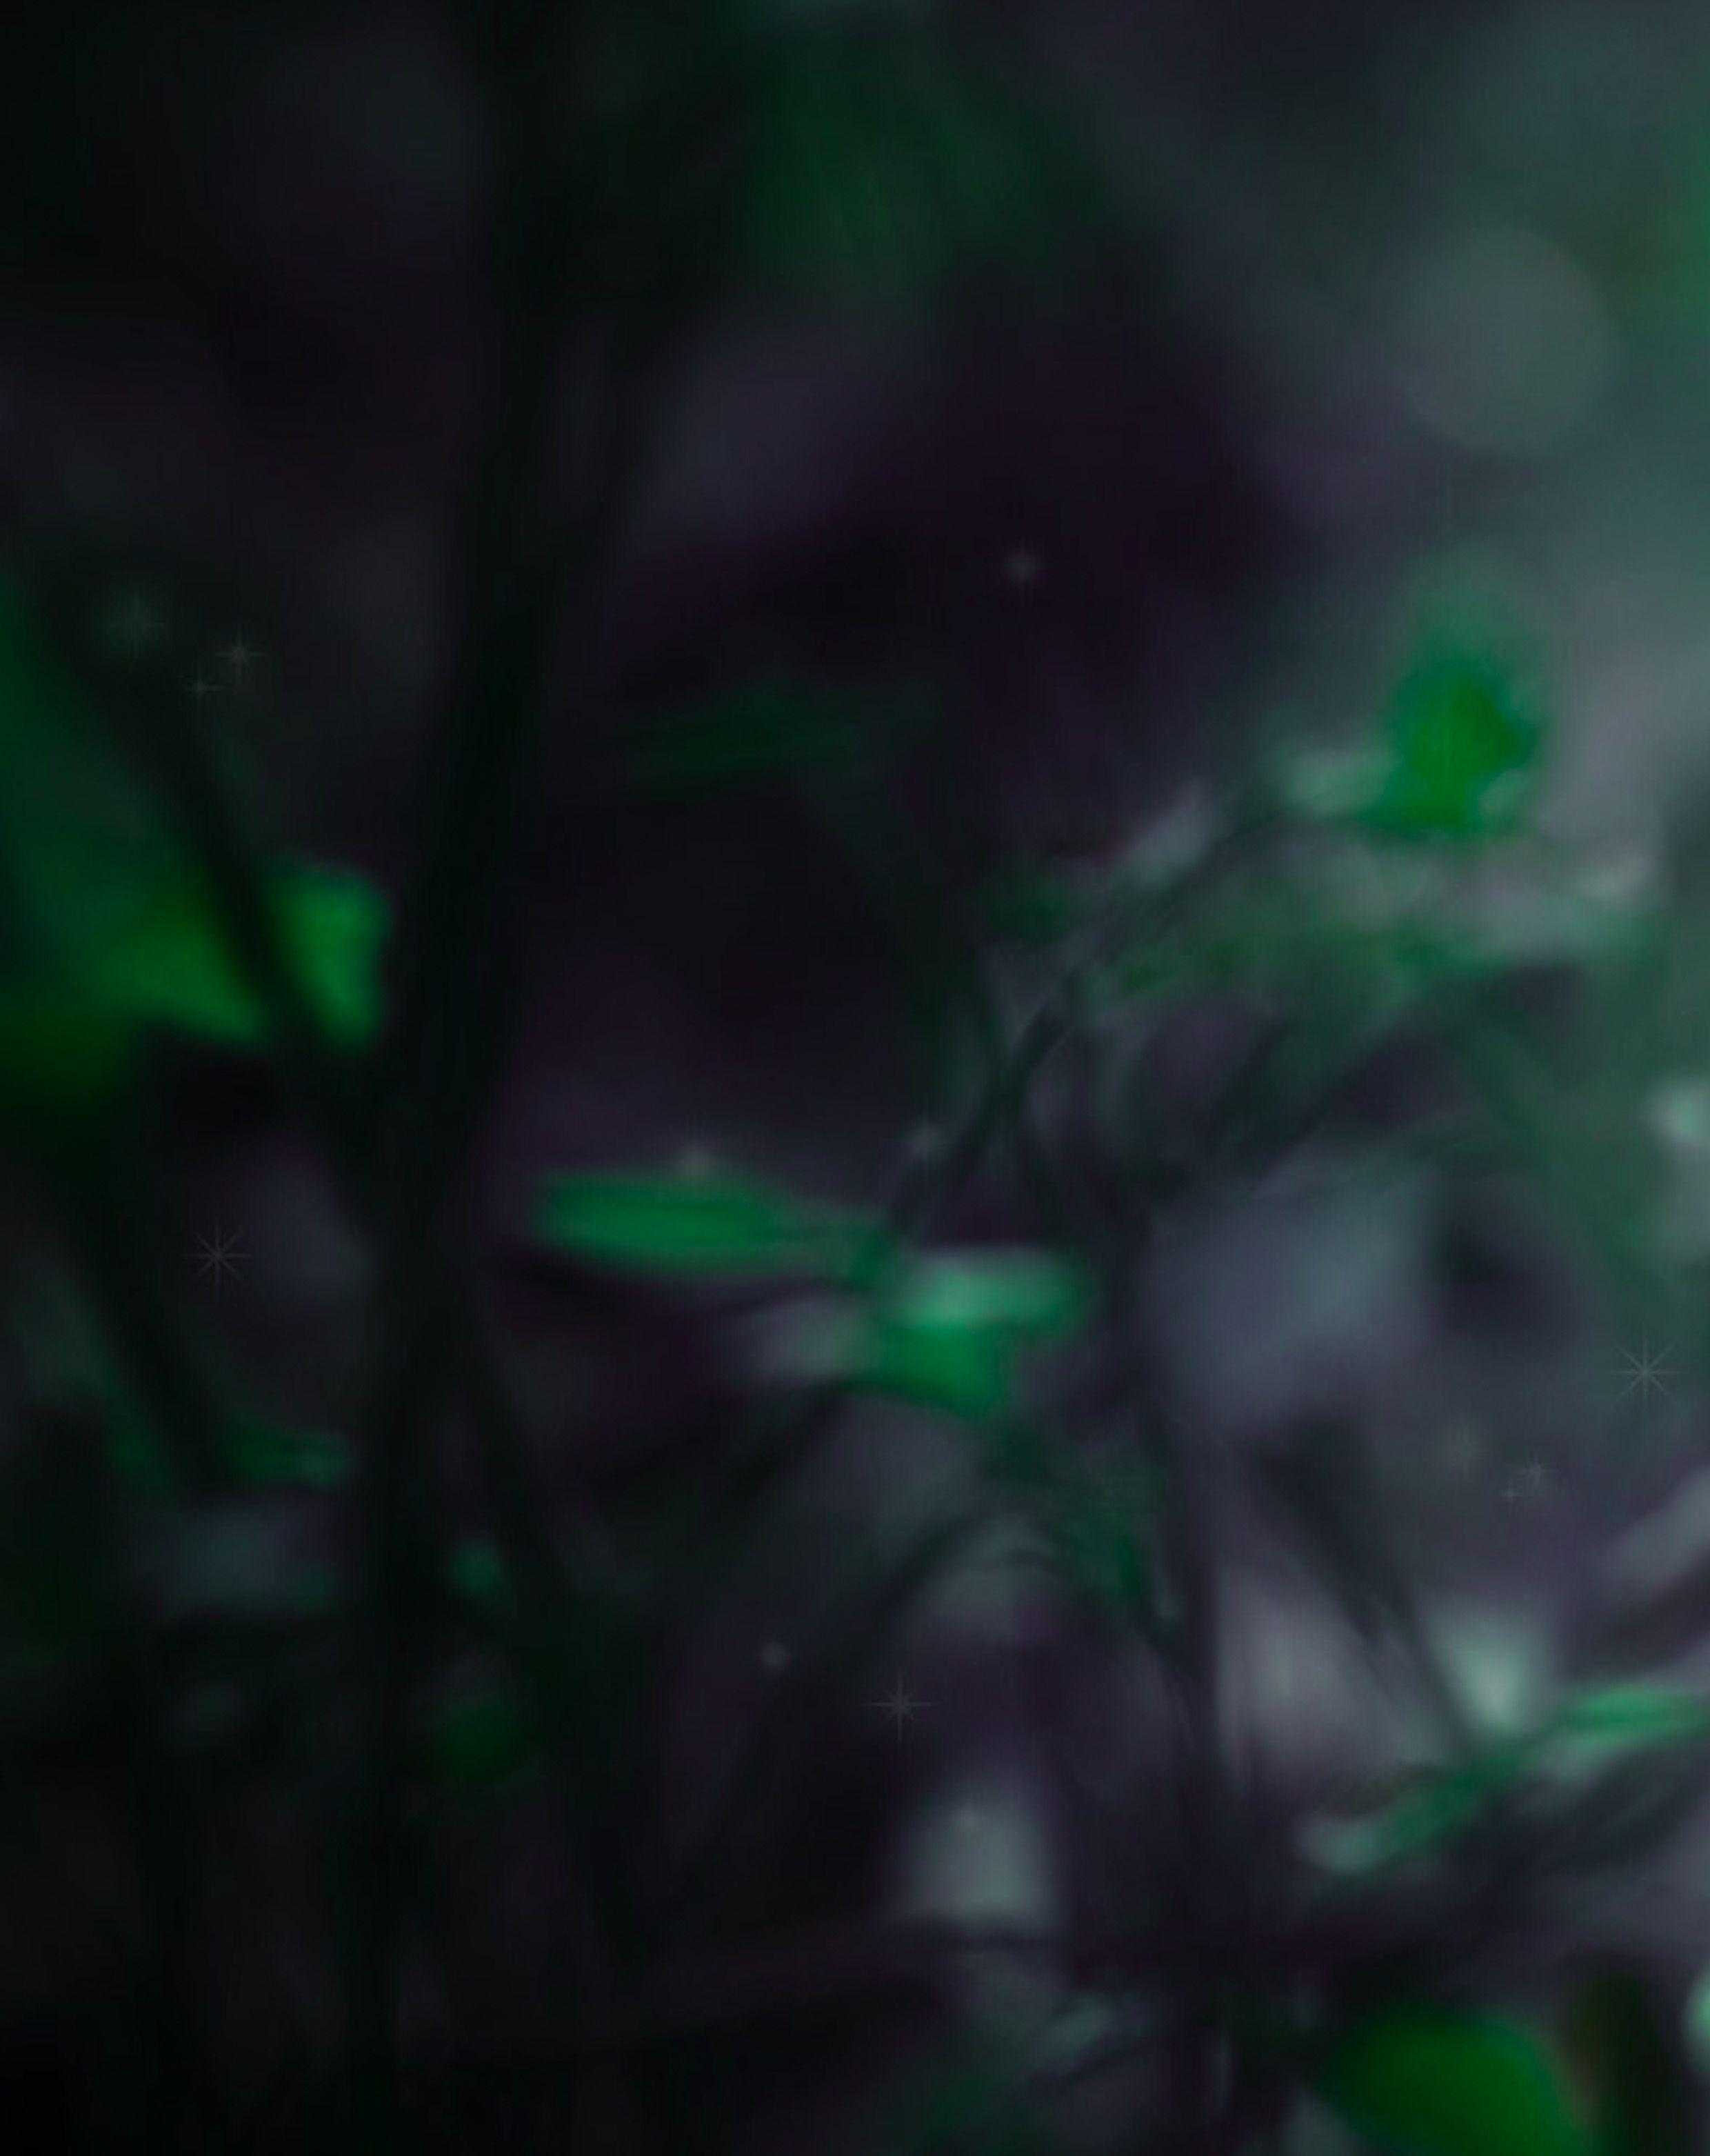 Dark Green Nature Blur Background Free Stock In 2020 Blurred Background Stock Images Free Background Images